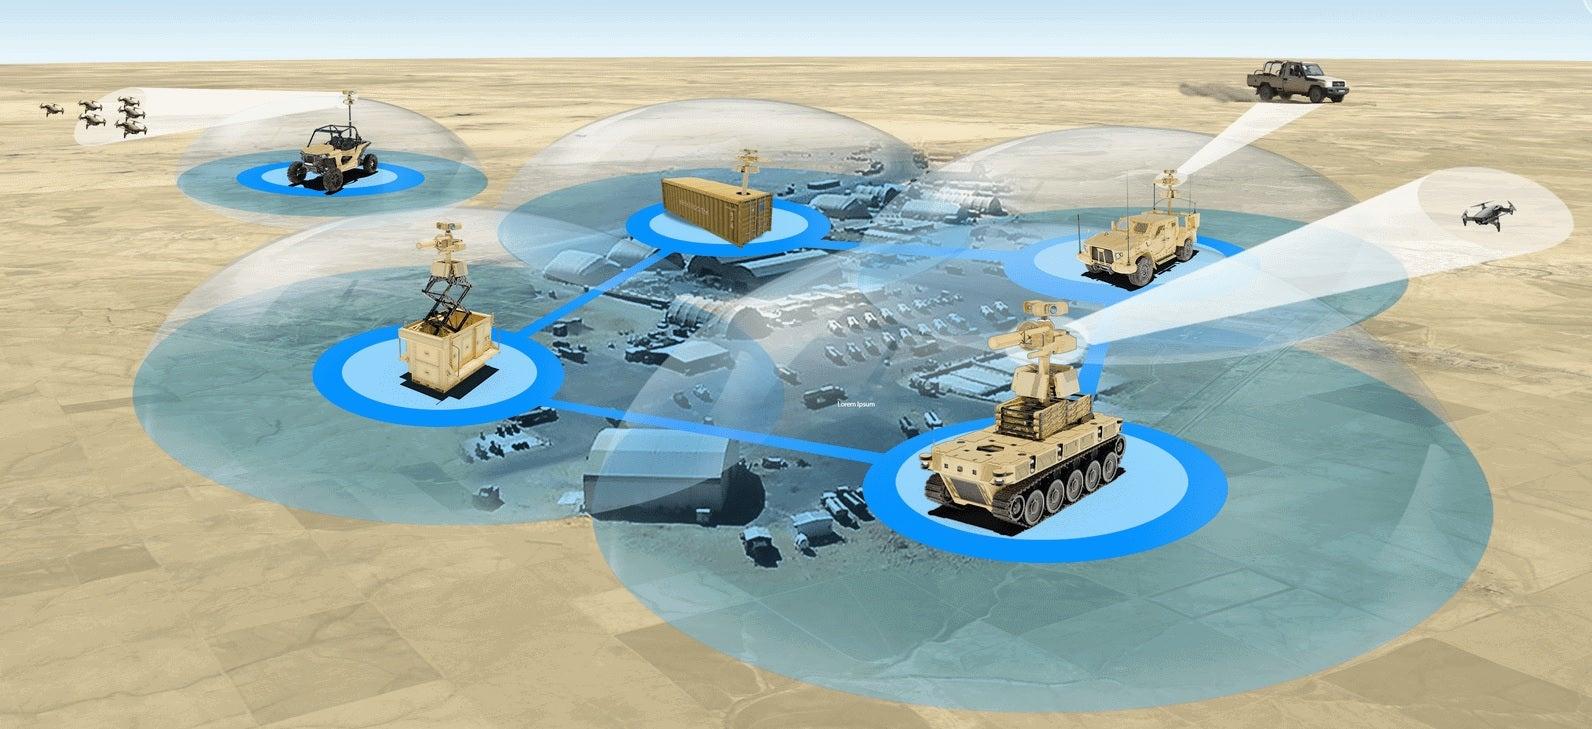 Liteye wins contract to support US Army RCCTO C-sUAS HEL prototype effort